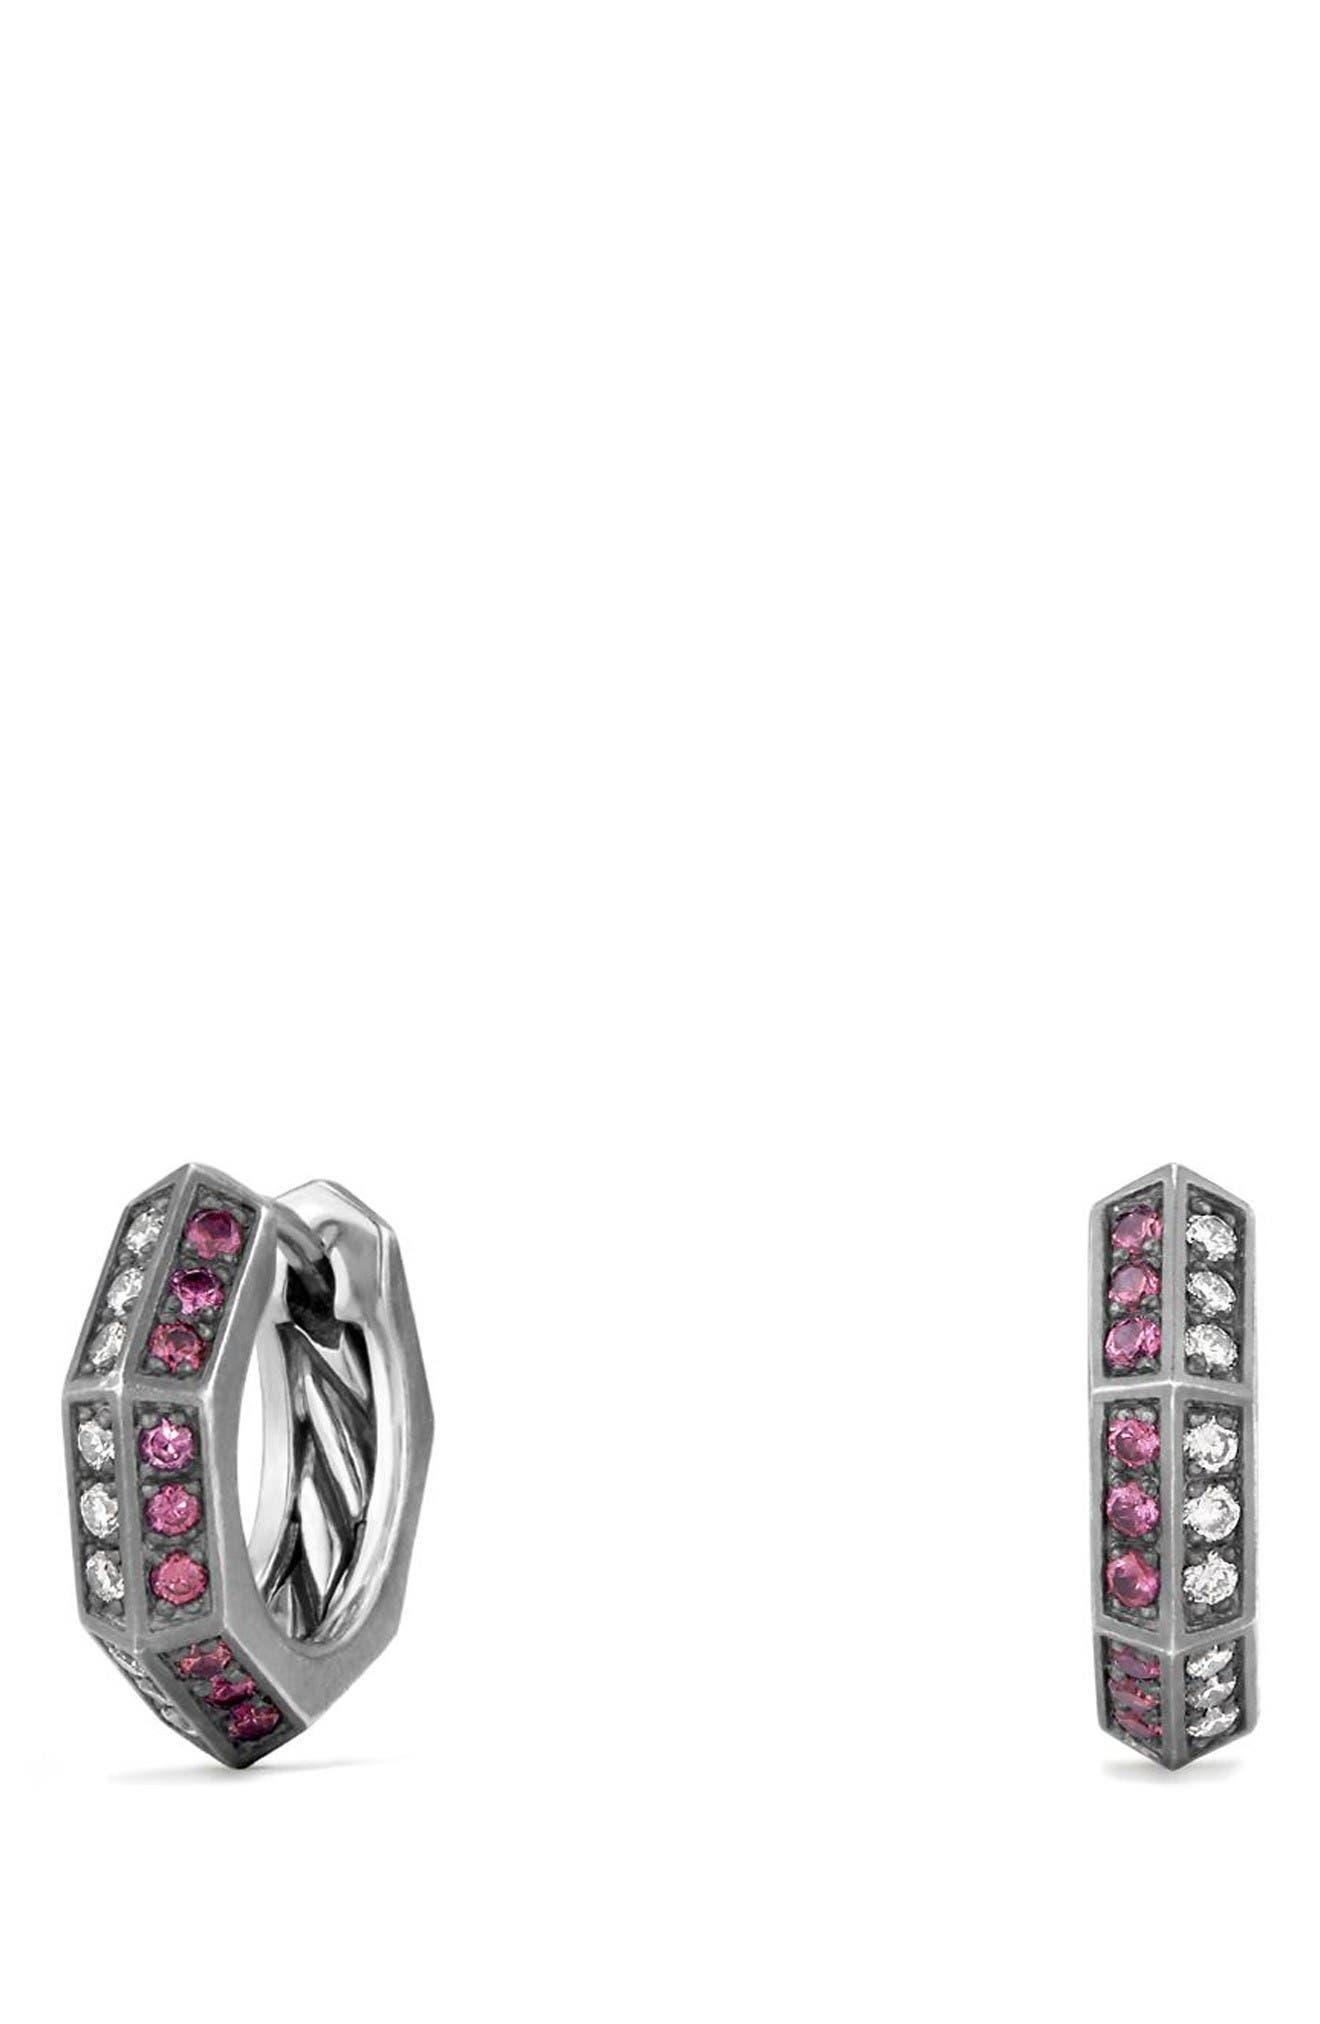 Main Image - David Yurman Stax Diamond & Ruby Hoop Earrings